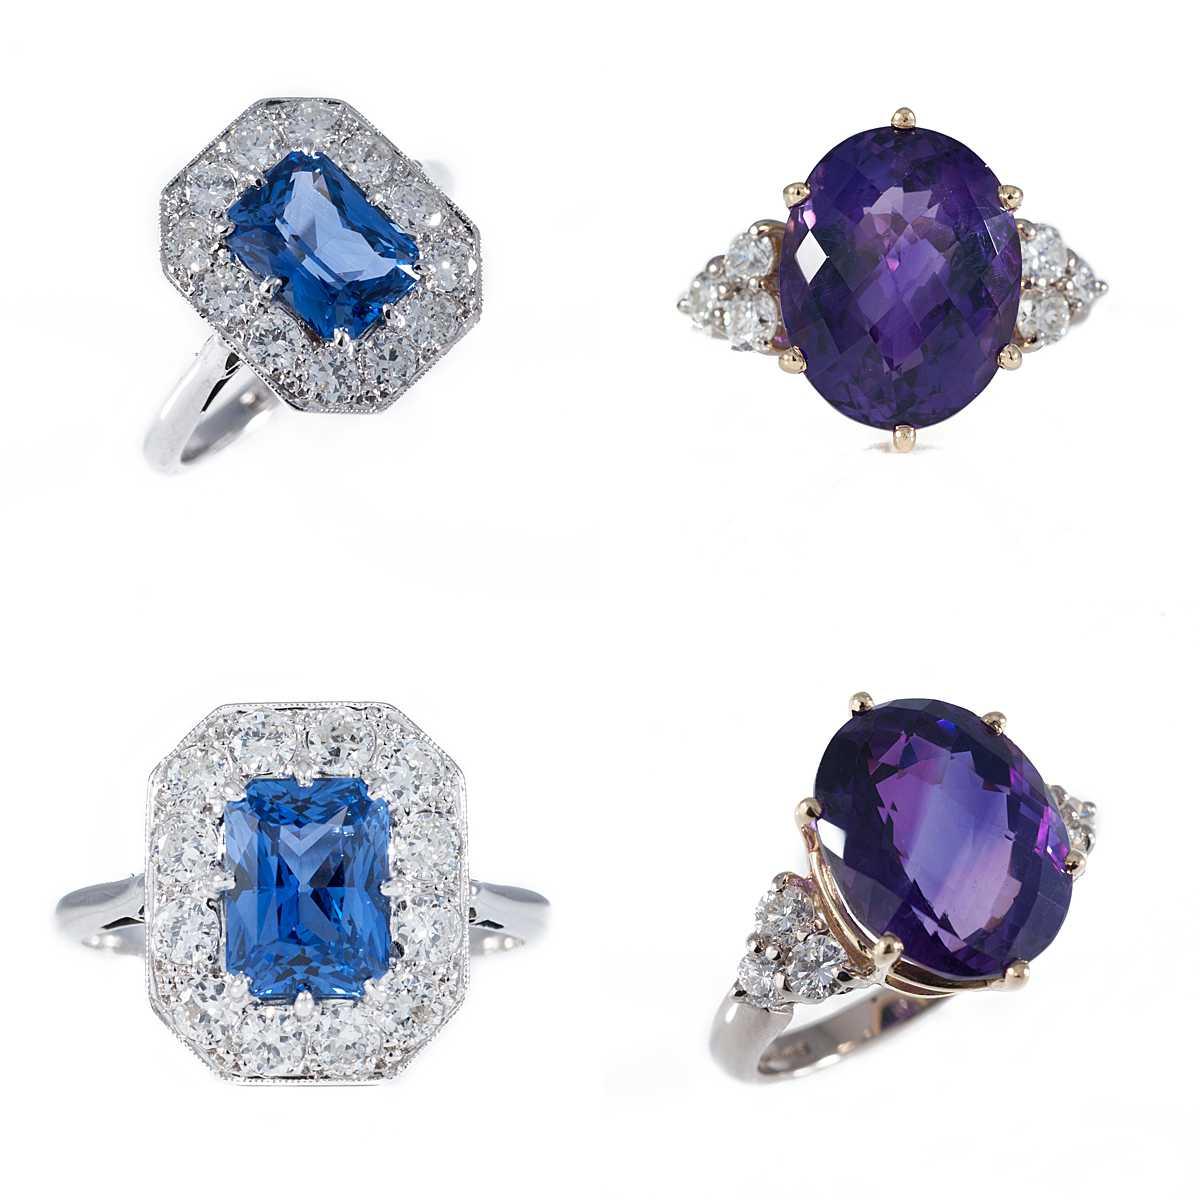 Unique Engagement Rings - Wedding Photography Edinburgh